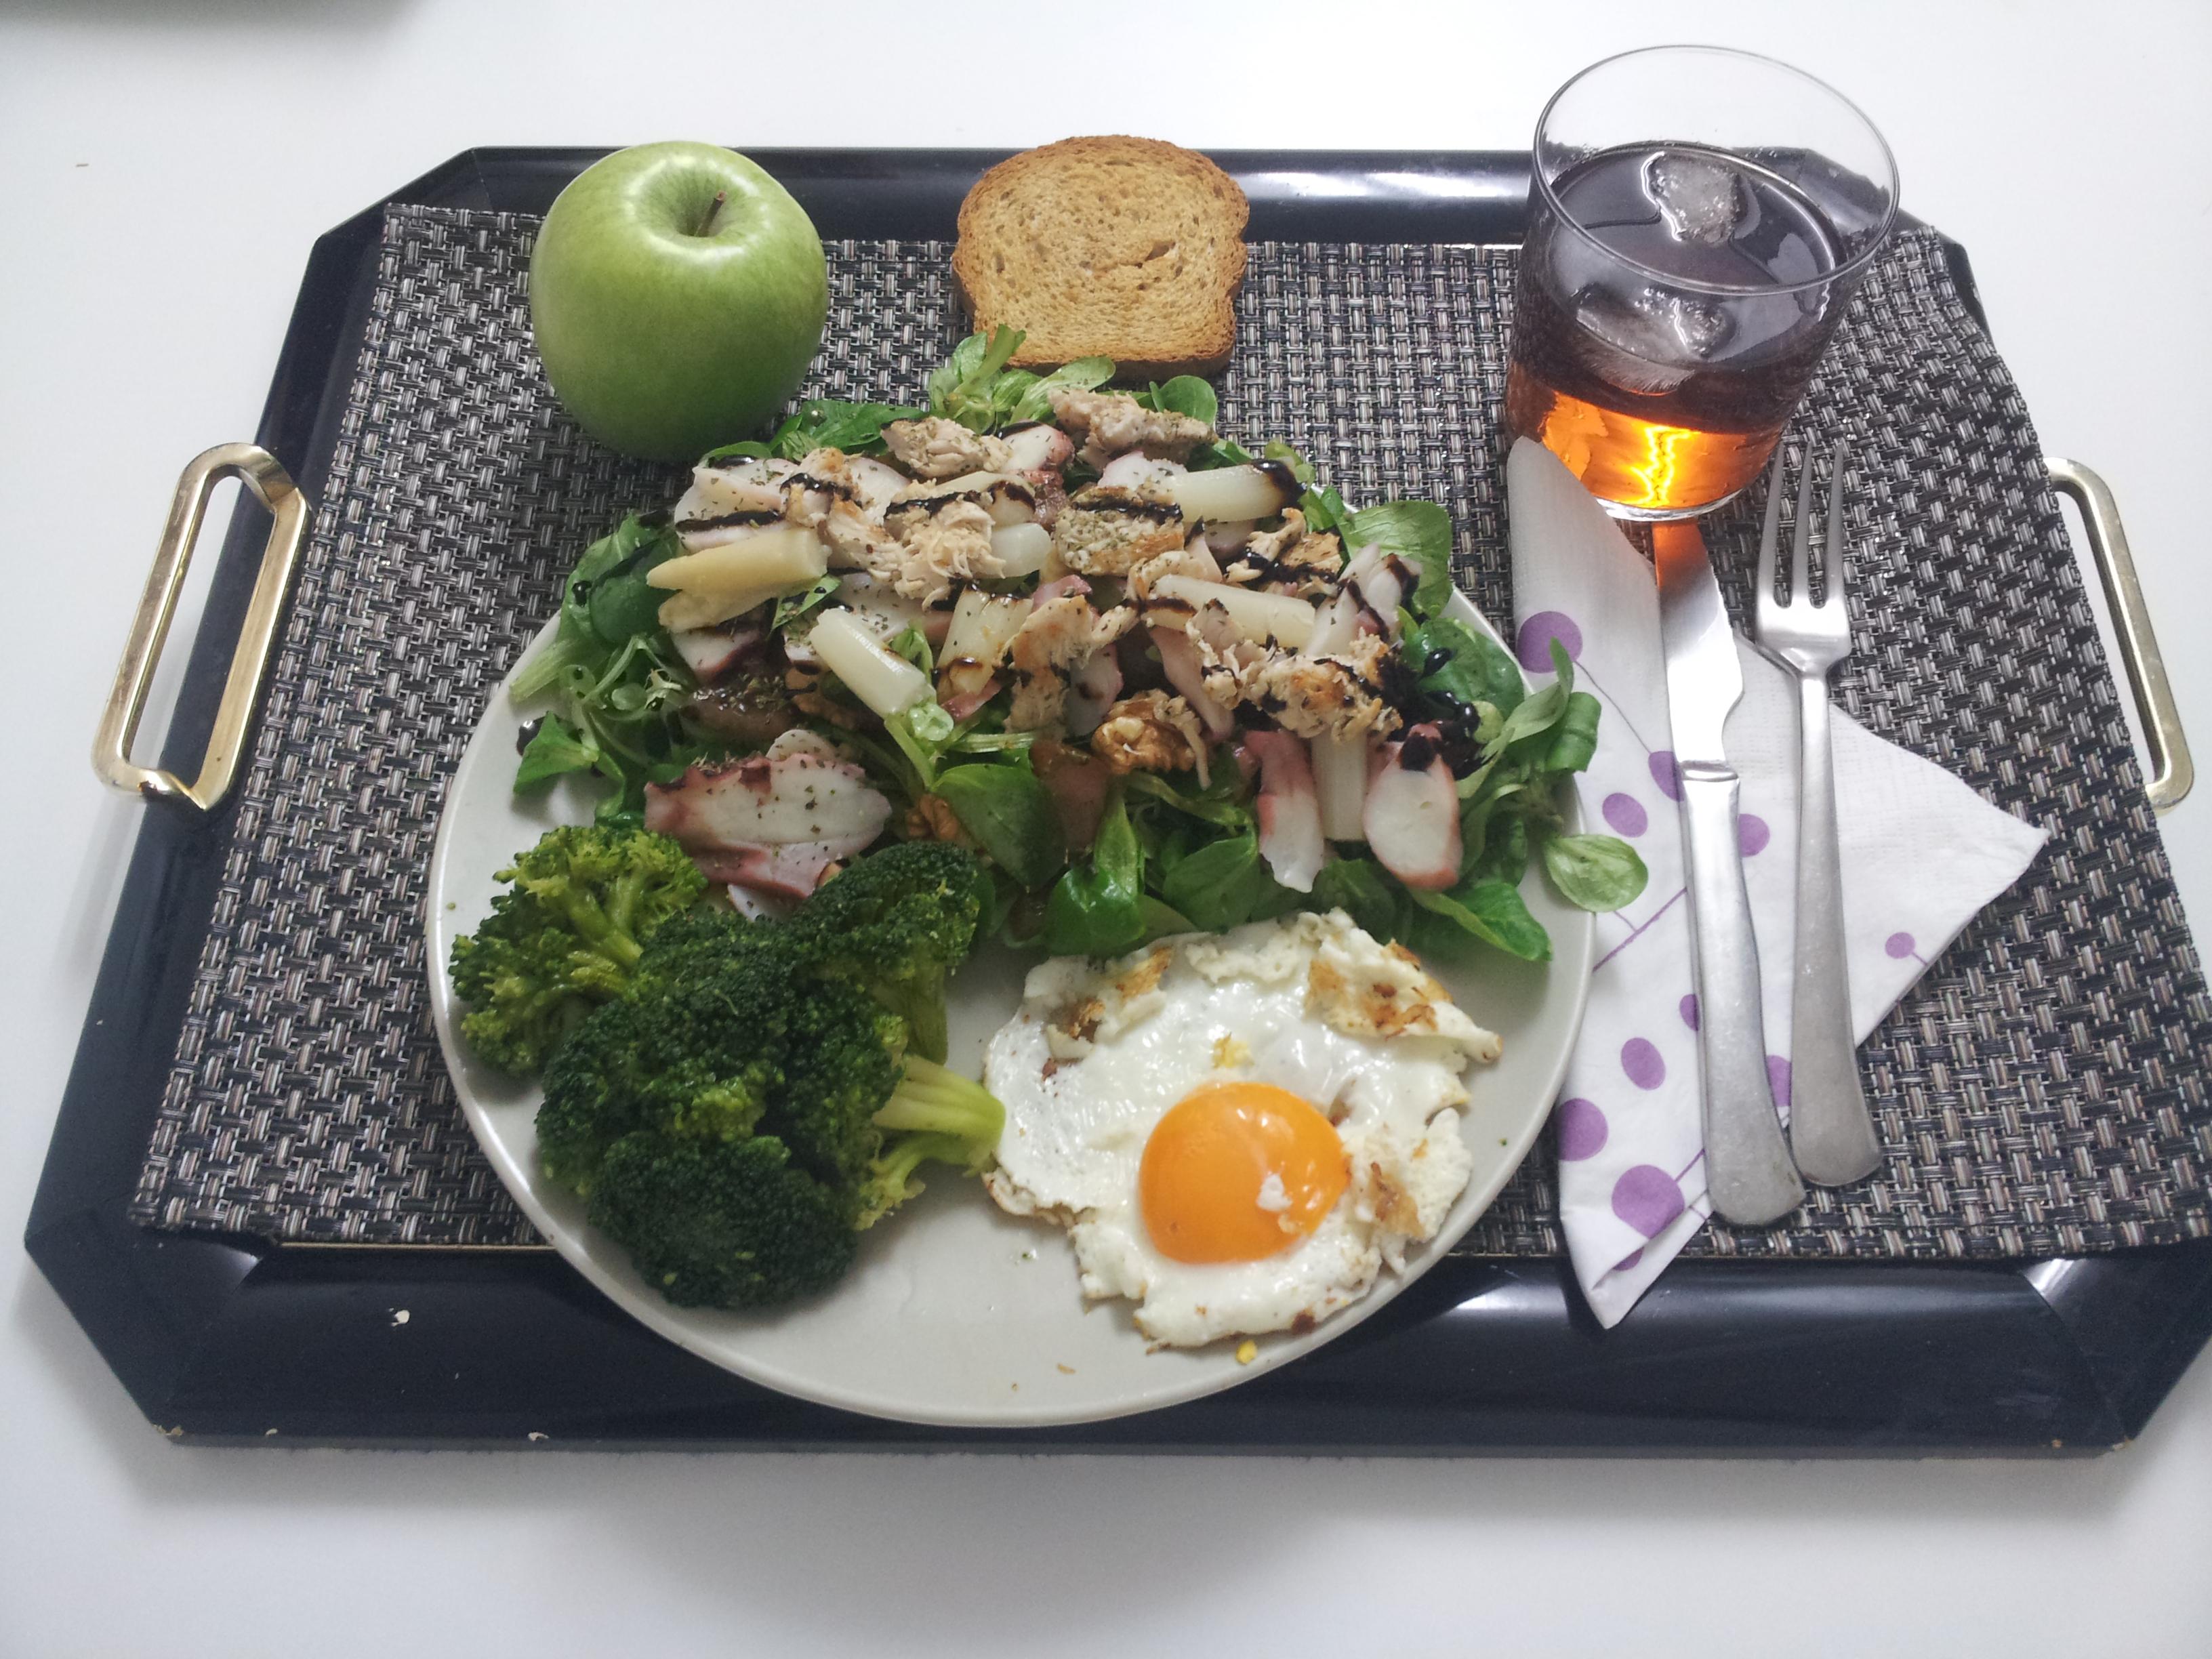 cenas saludables, cenas fitness, recetas saludables